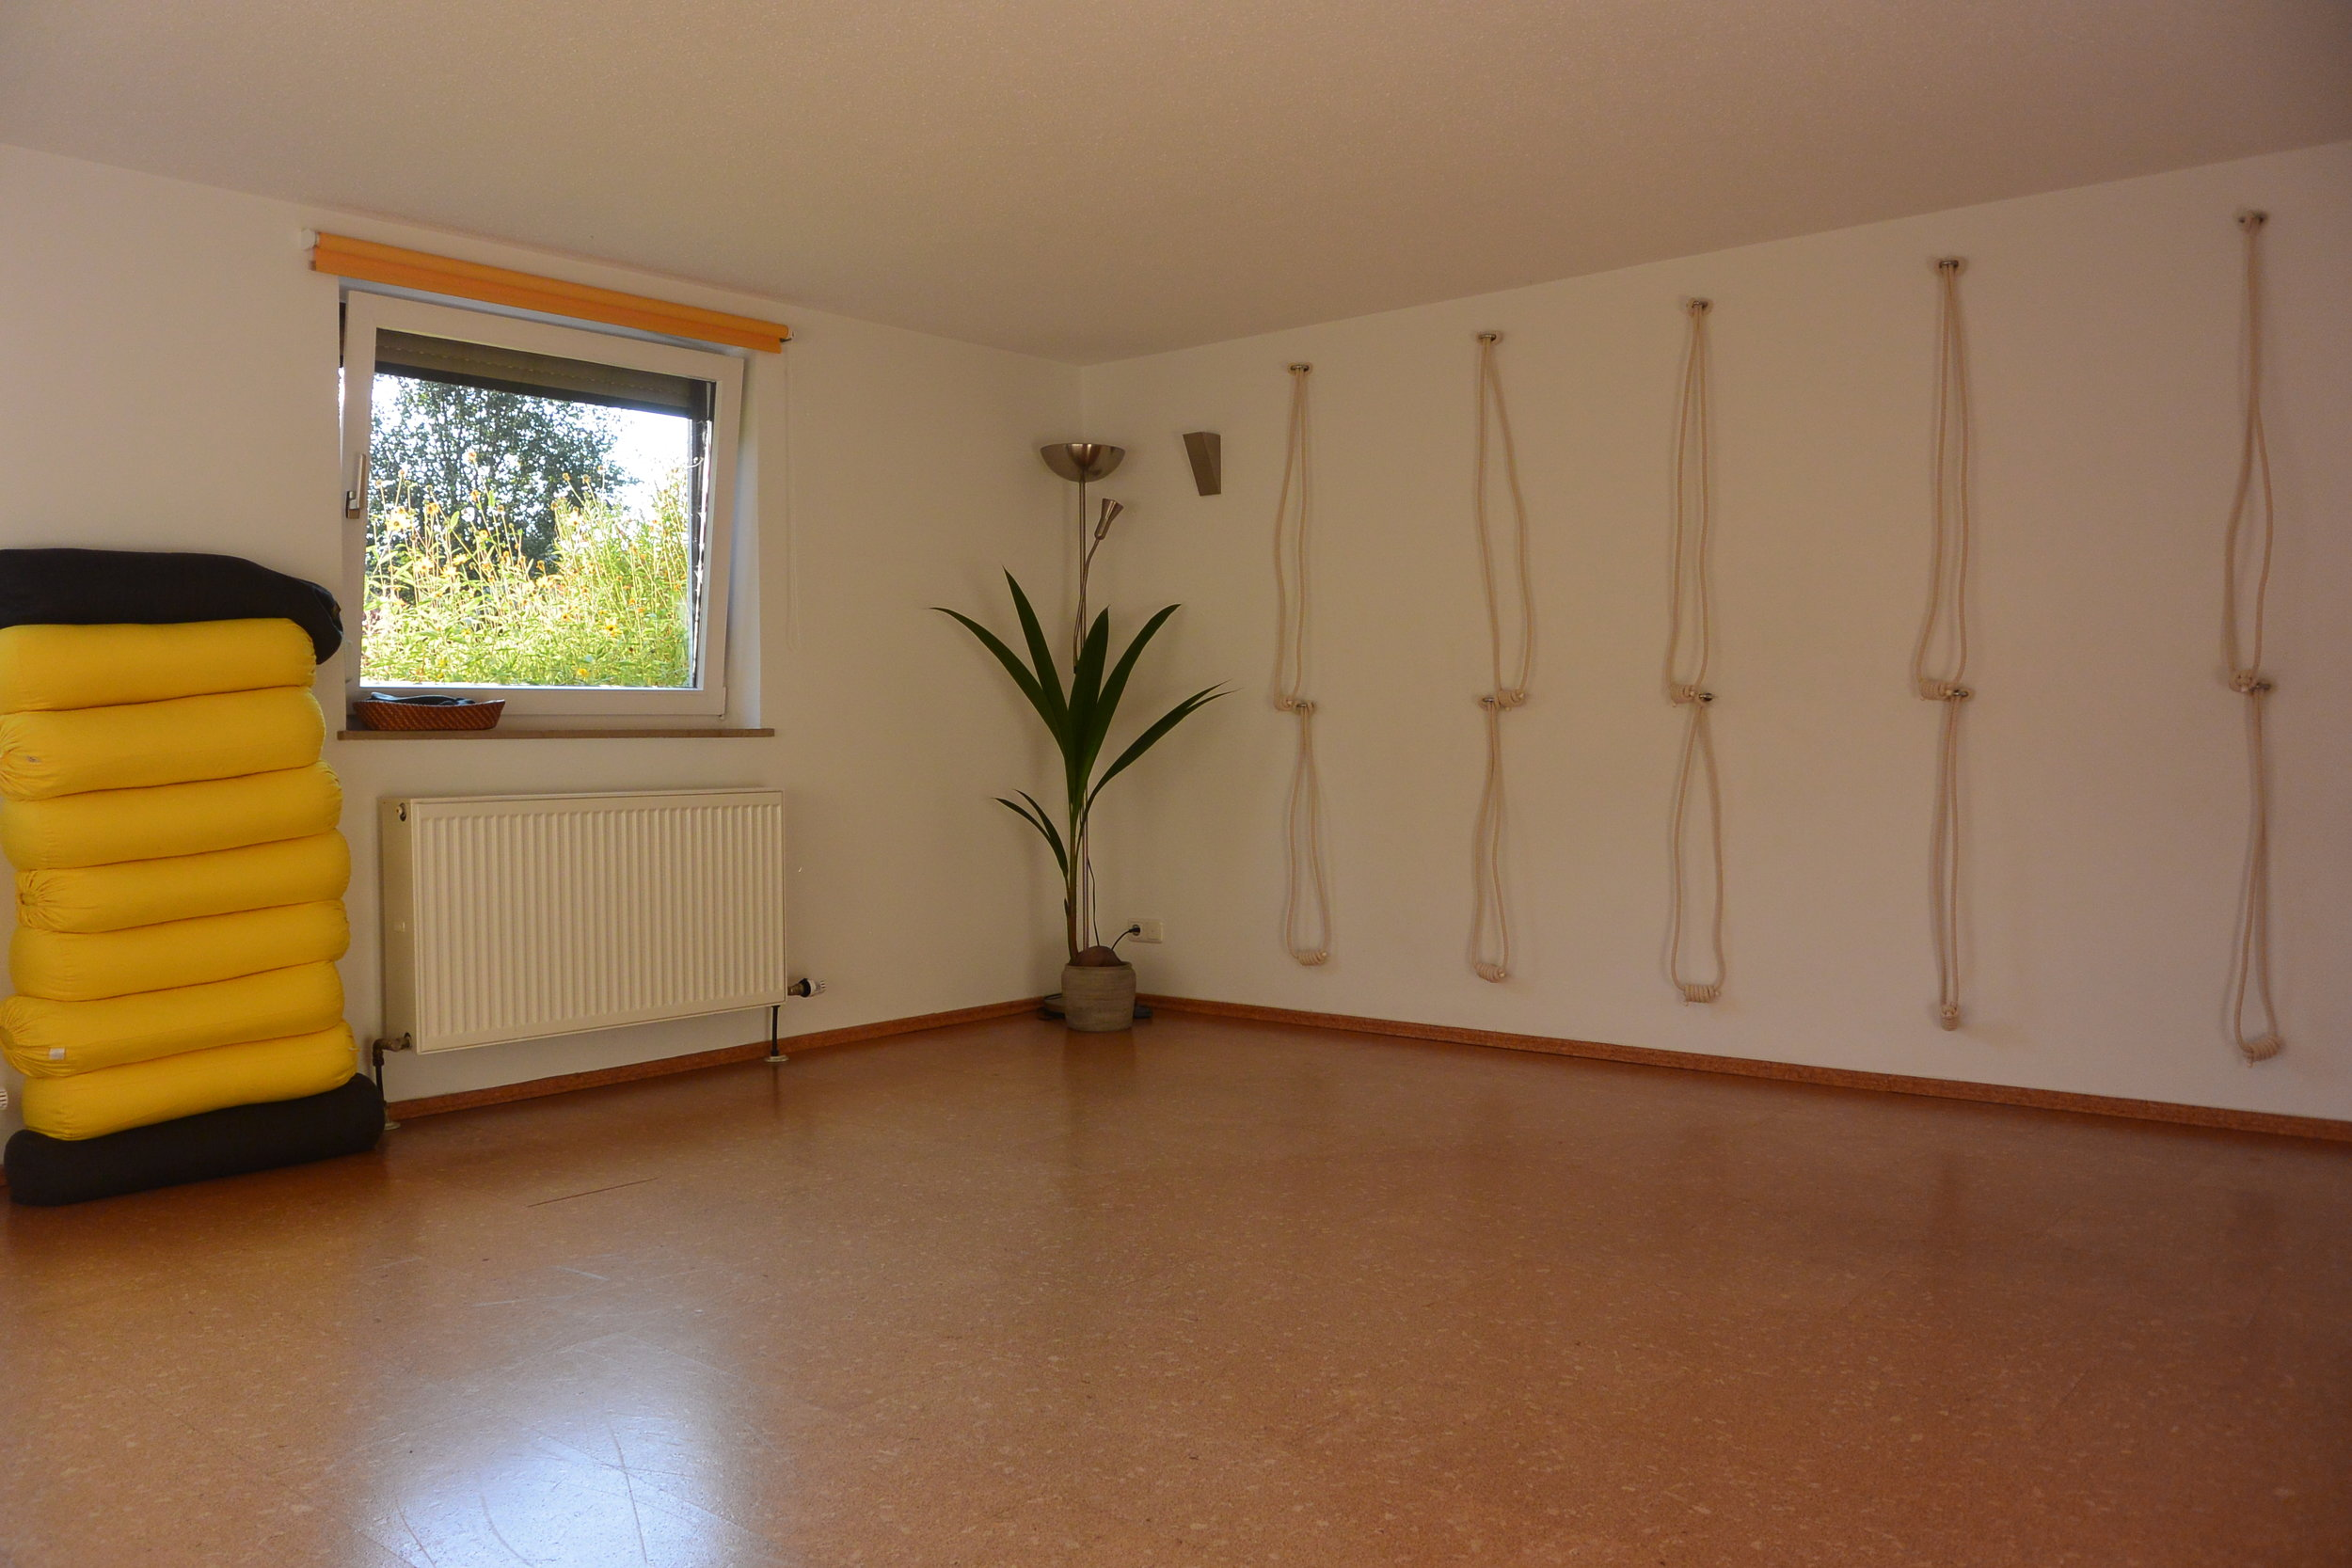 Yoga-Studio Weiden-Neunkirchen--klein, aber fein!